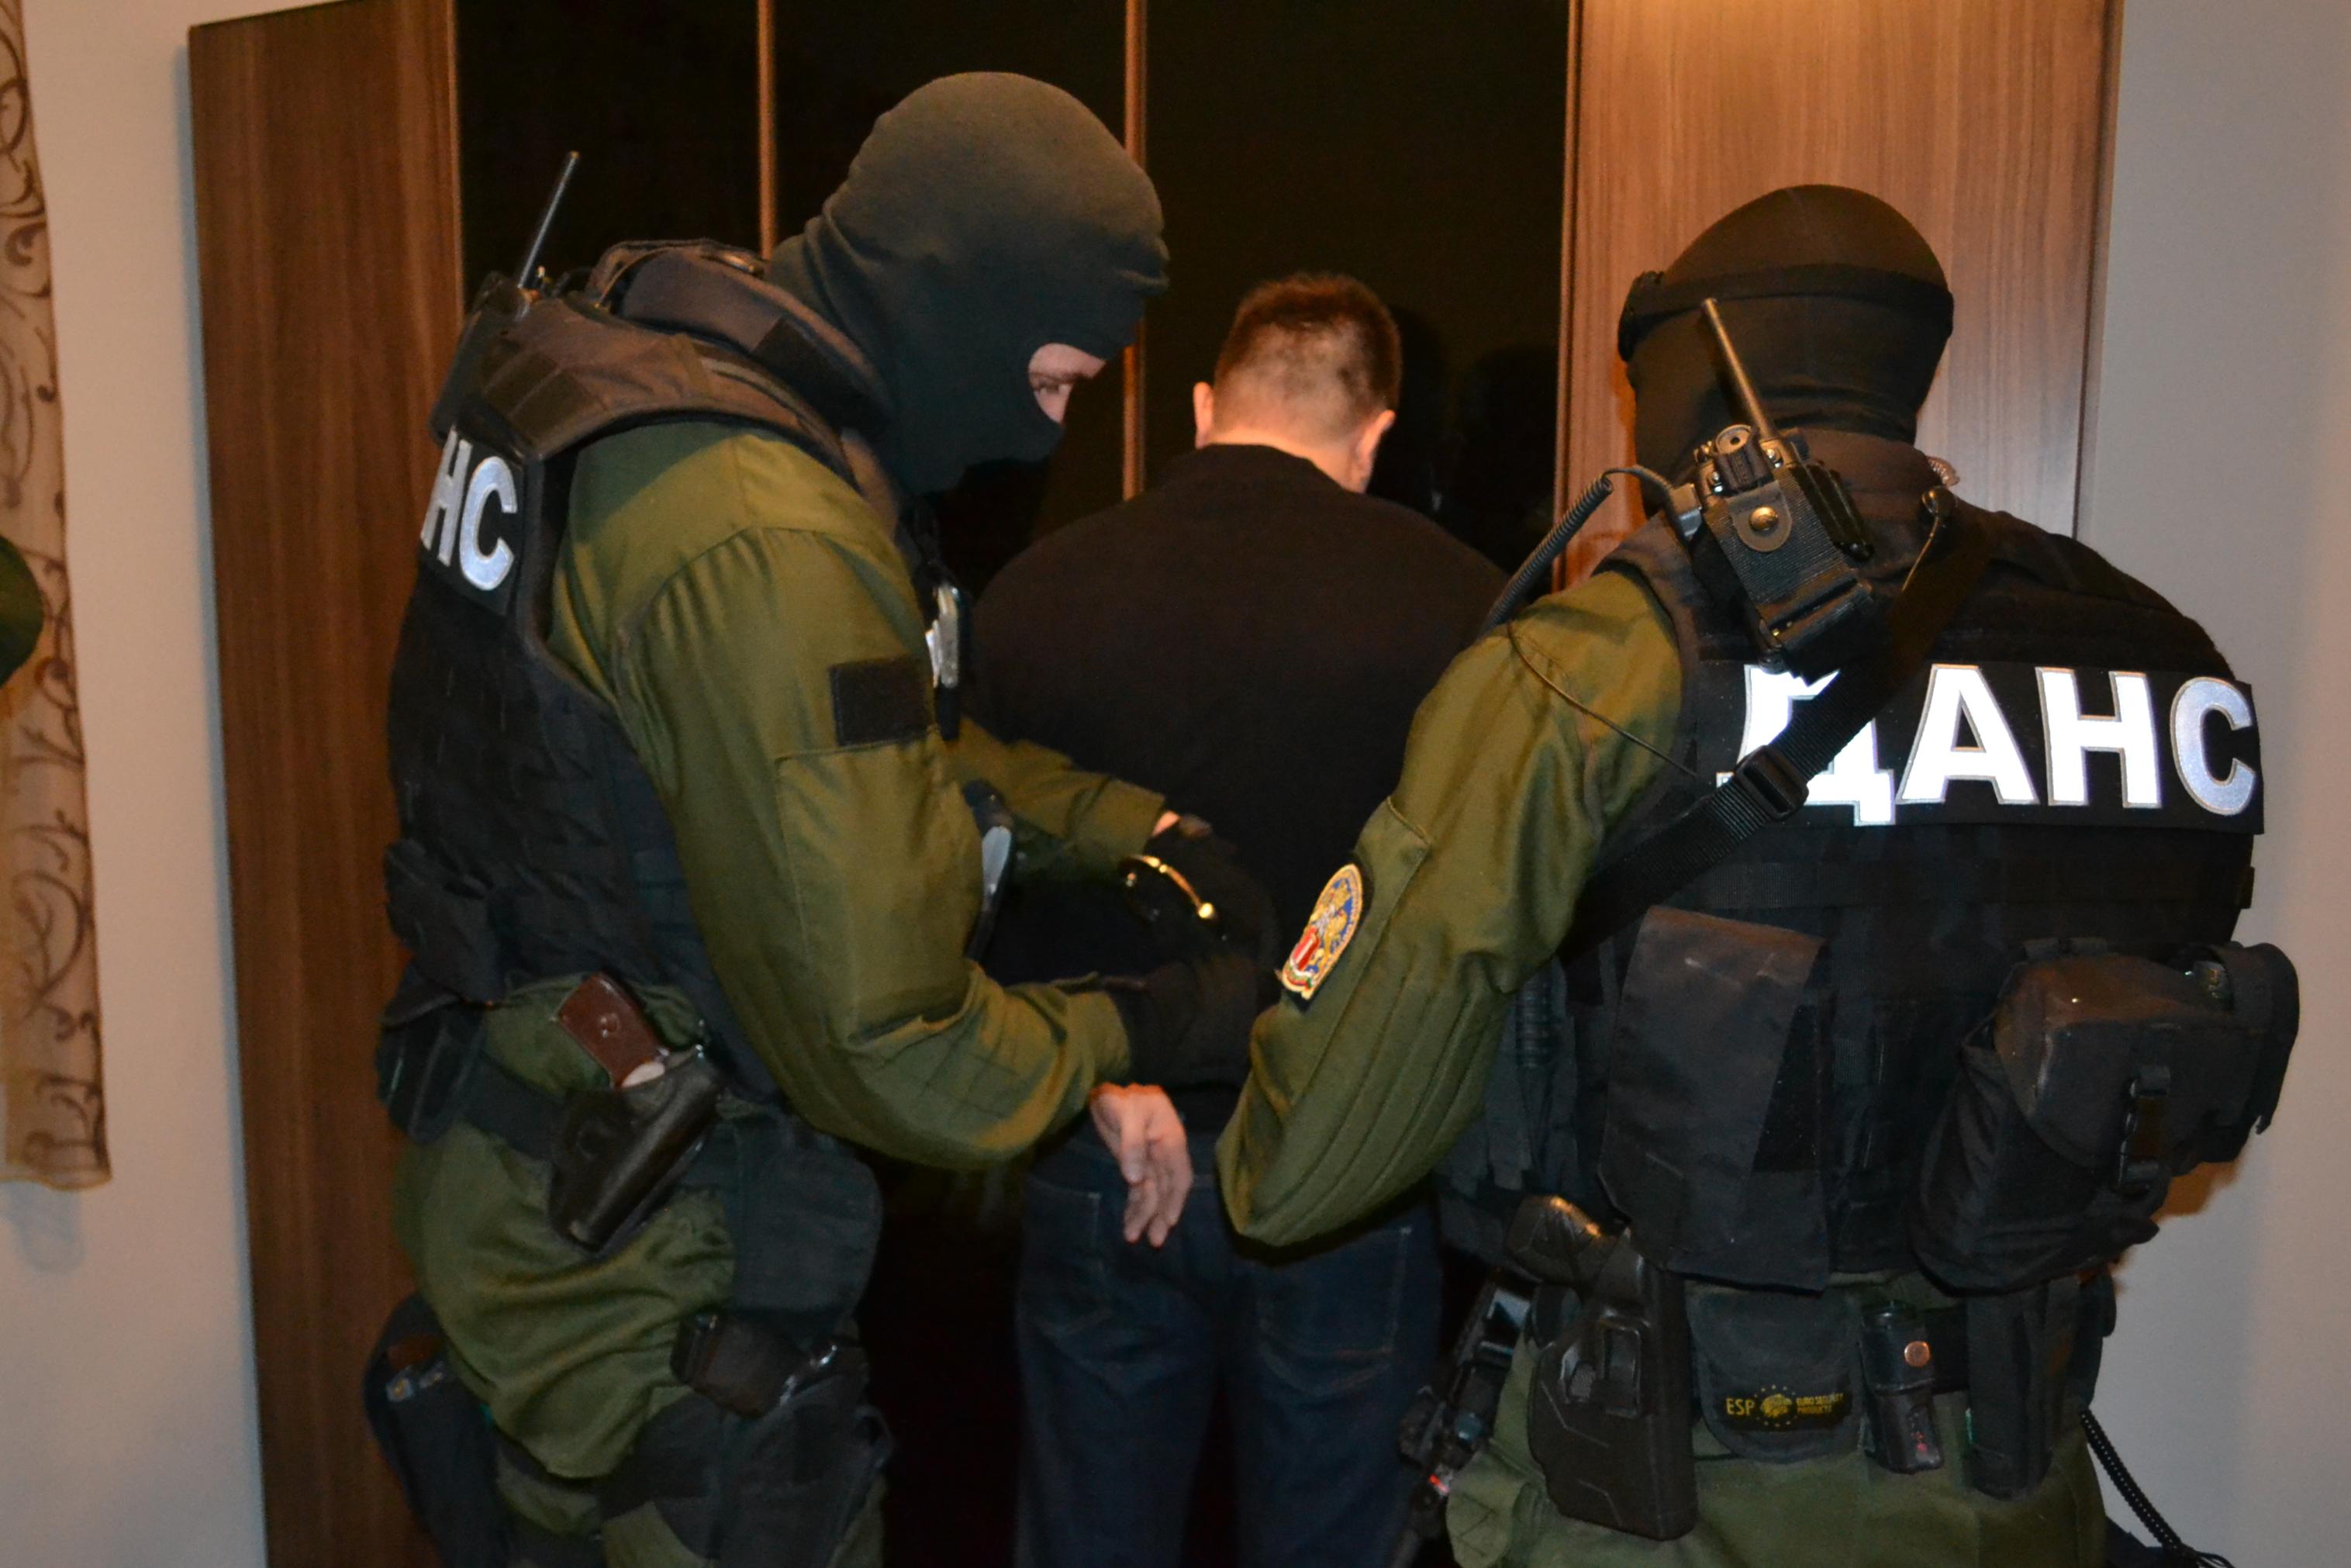 Bulgarian Counterintelligence Bust Russian Sleeper Cell Network